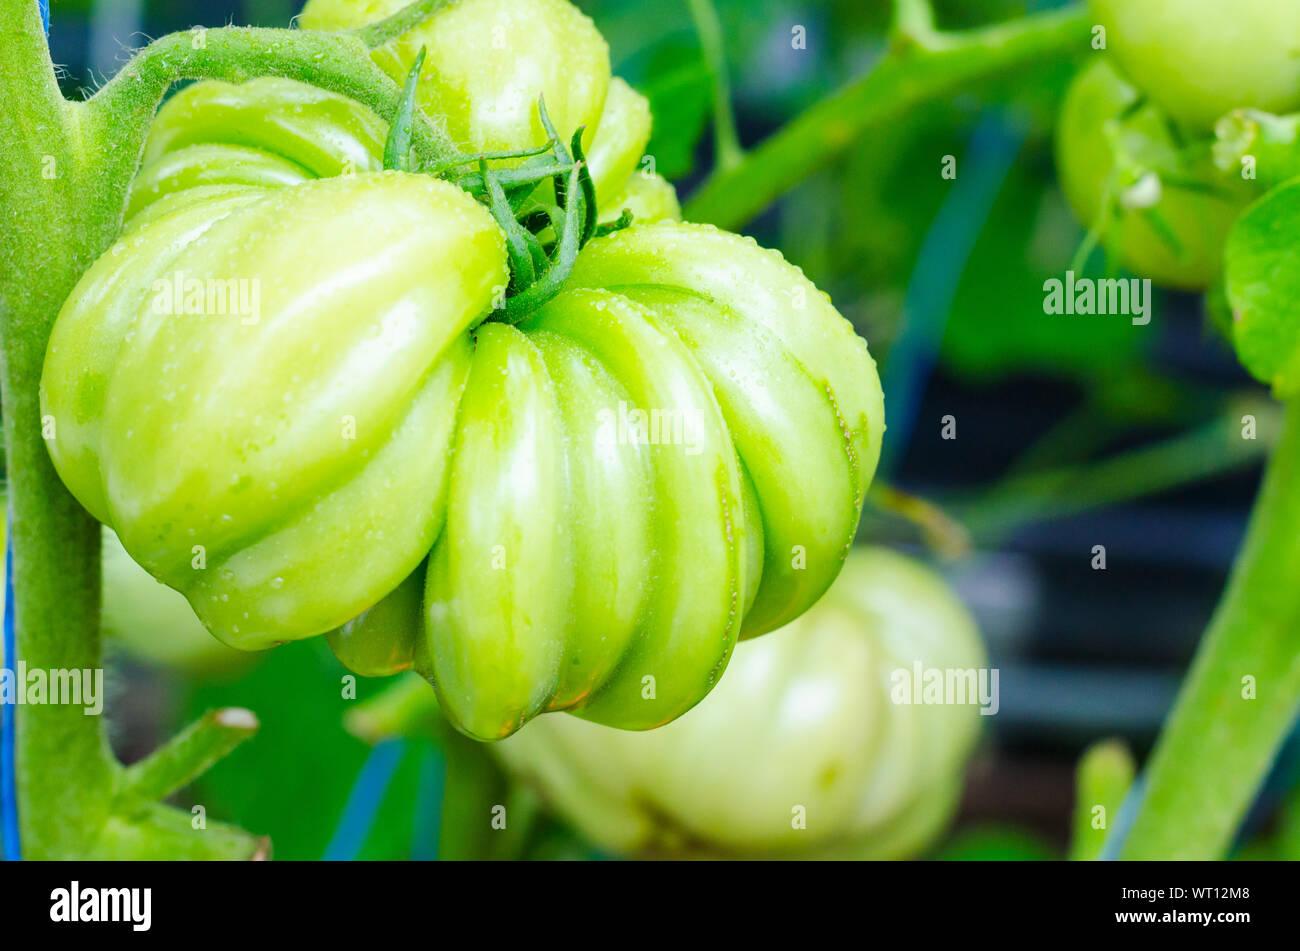 Green fruit of an unripe tomato beefsteak on bush. Studio Photo Stock Photo